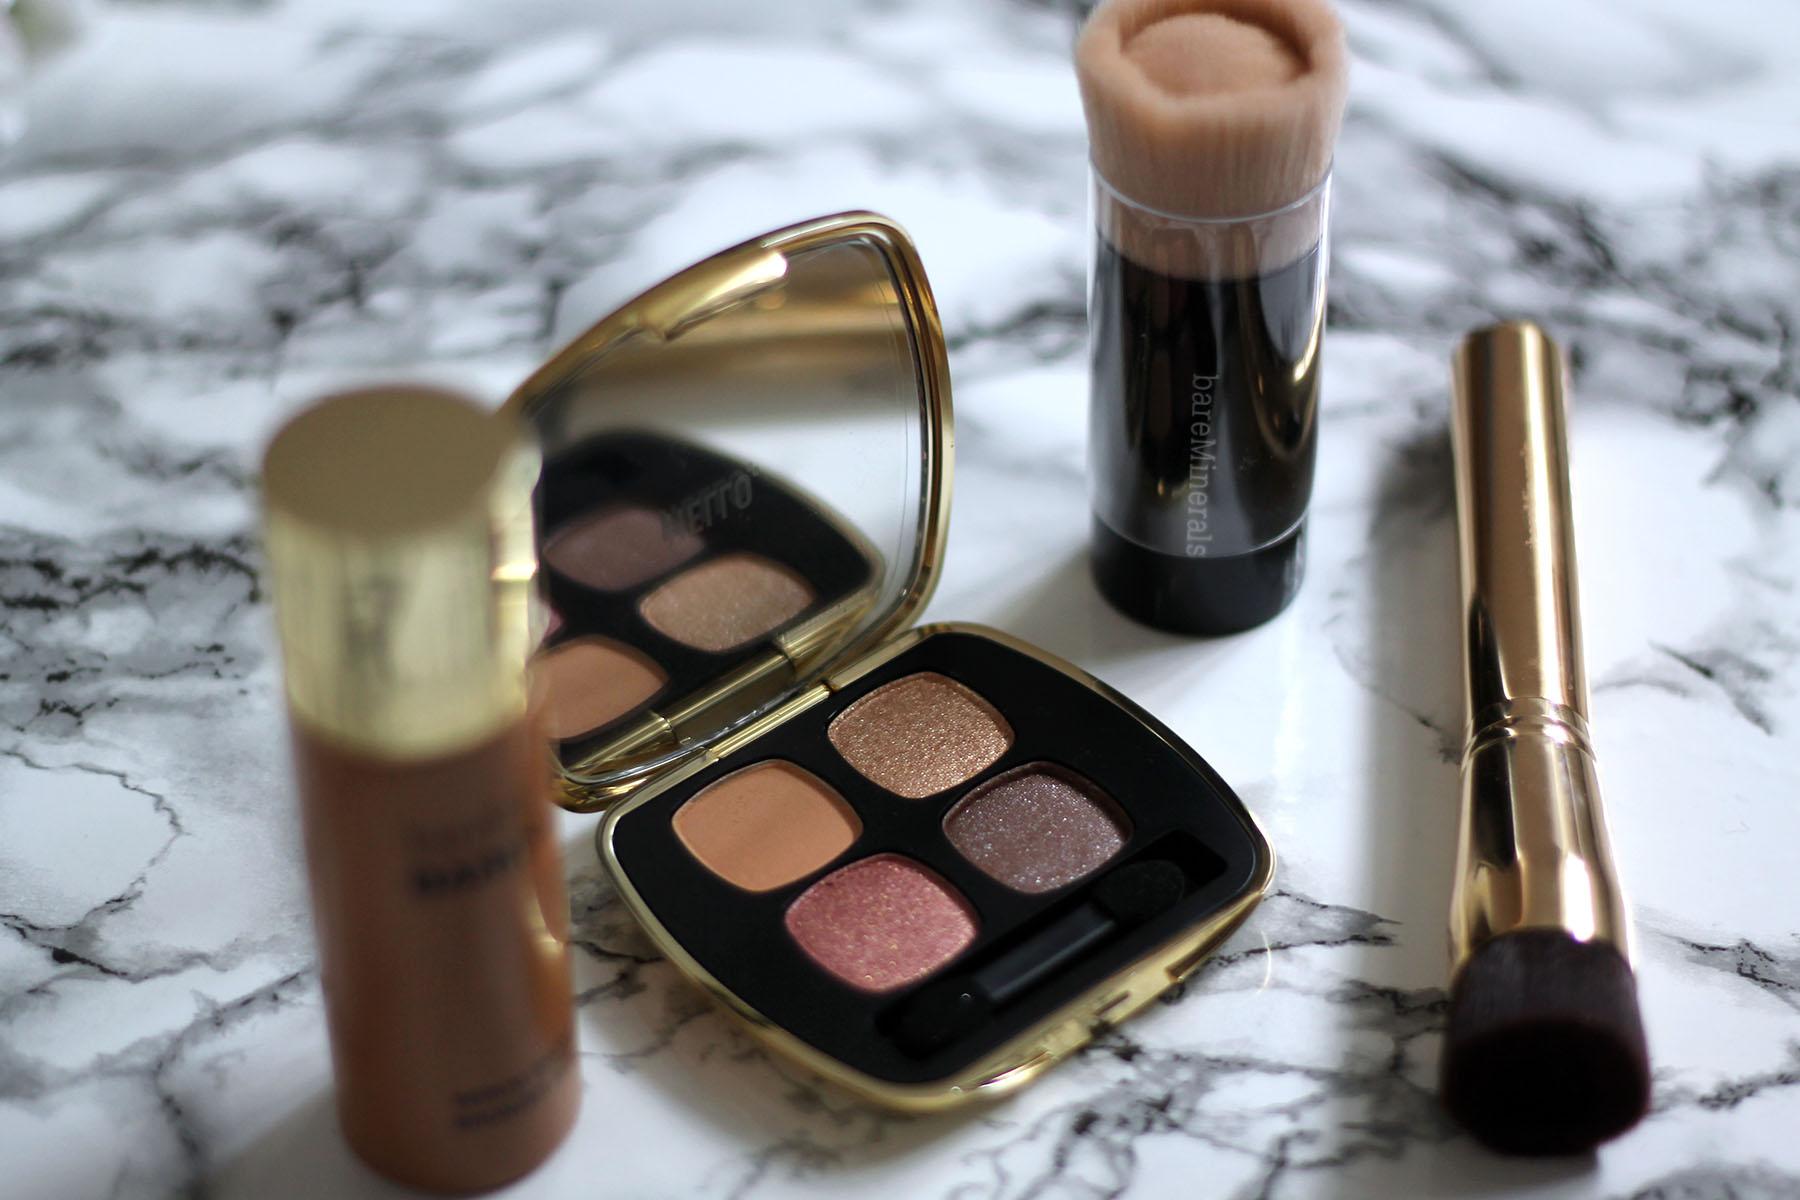 u-makeup-review-beauty-beautyblog-trend-look